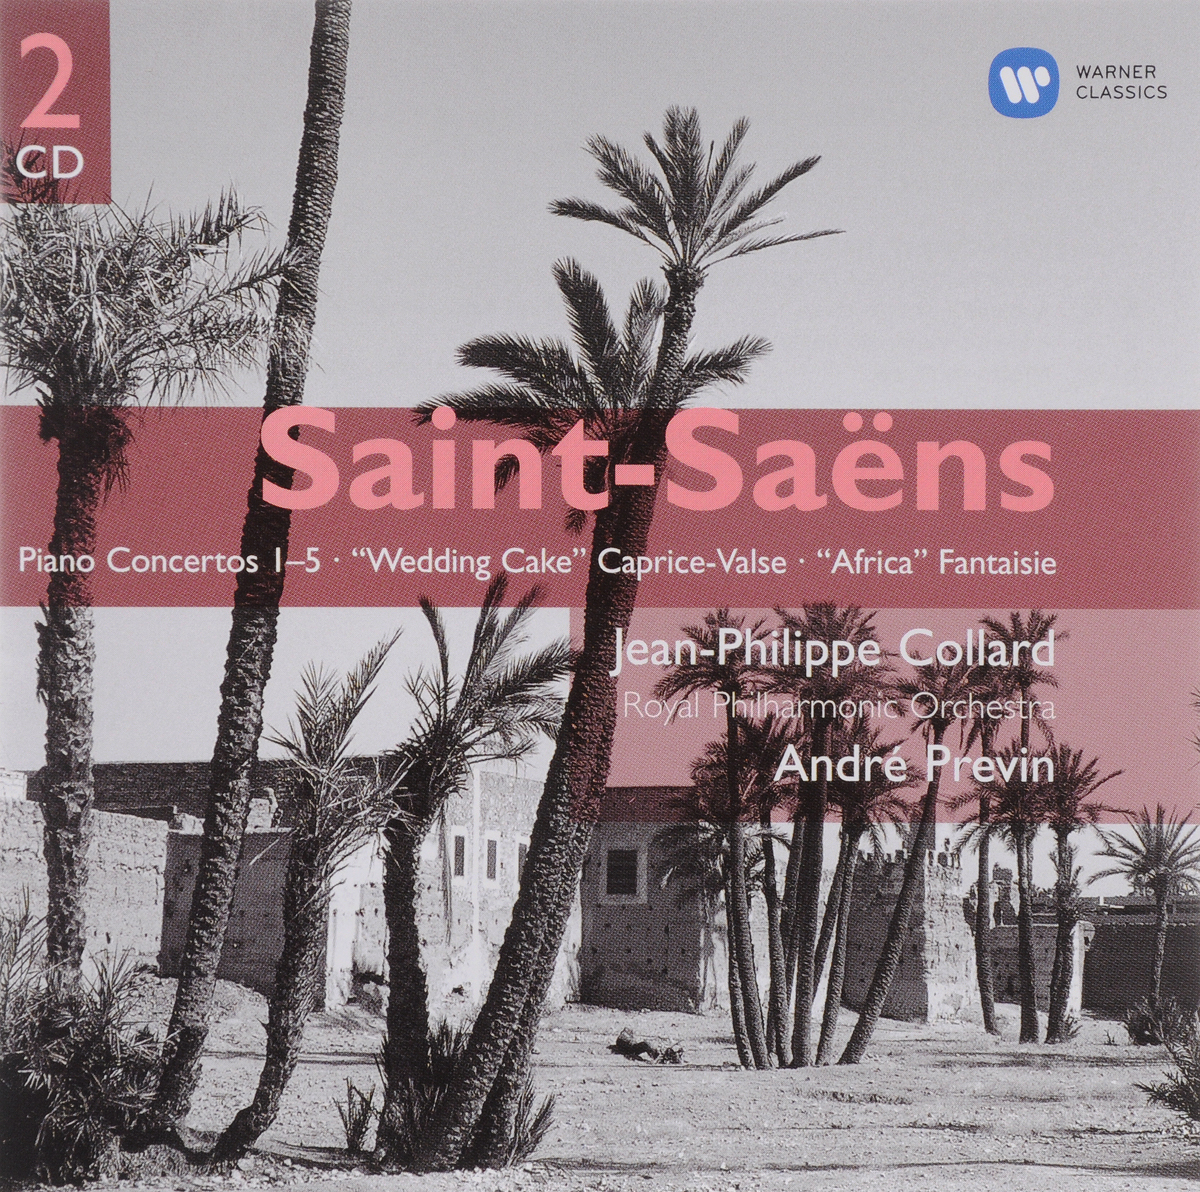 Jean-Phillipe Collard, Camille Saint-Saens. Saint-Saens: Piano Concertos 1-5 etc